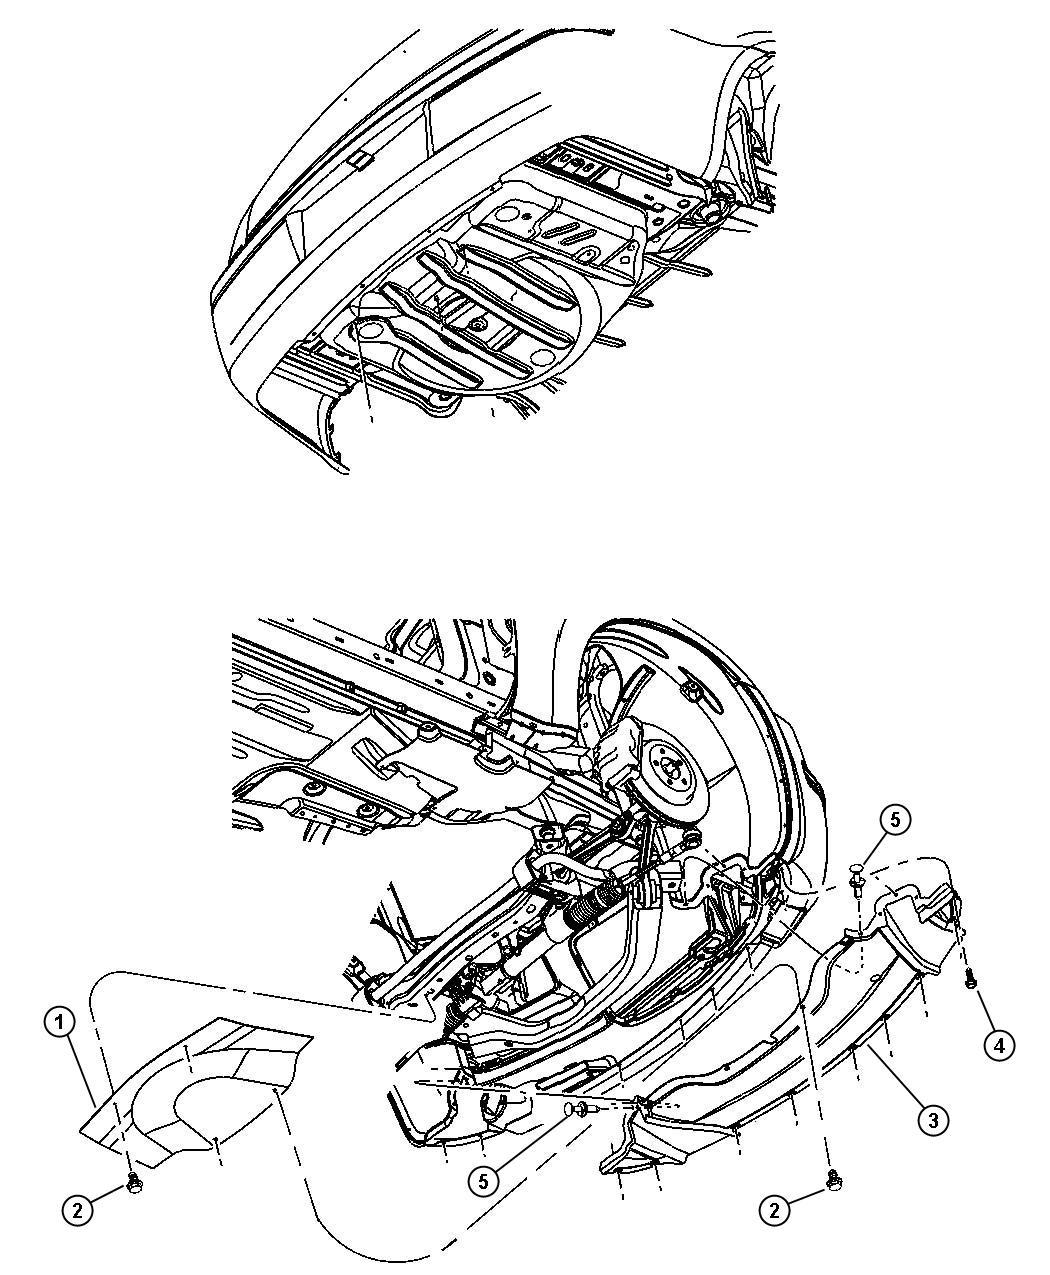 2010 Dodge Challenger R/T 5.7L Hemi V8 M/T Belly pan